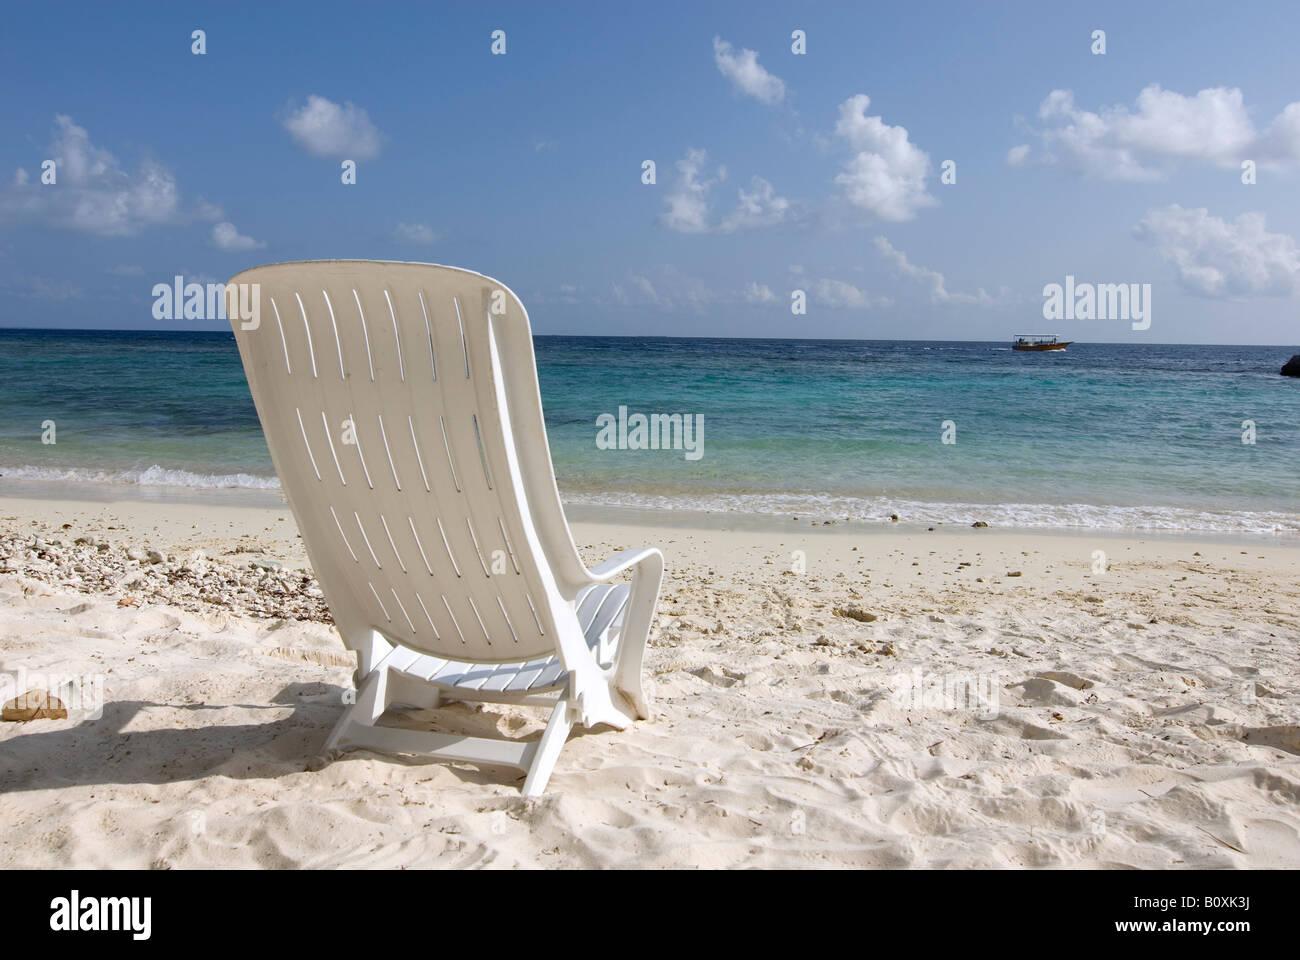 Maledives, Gan, Chair on beach - Stock Image